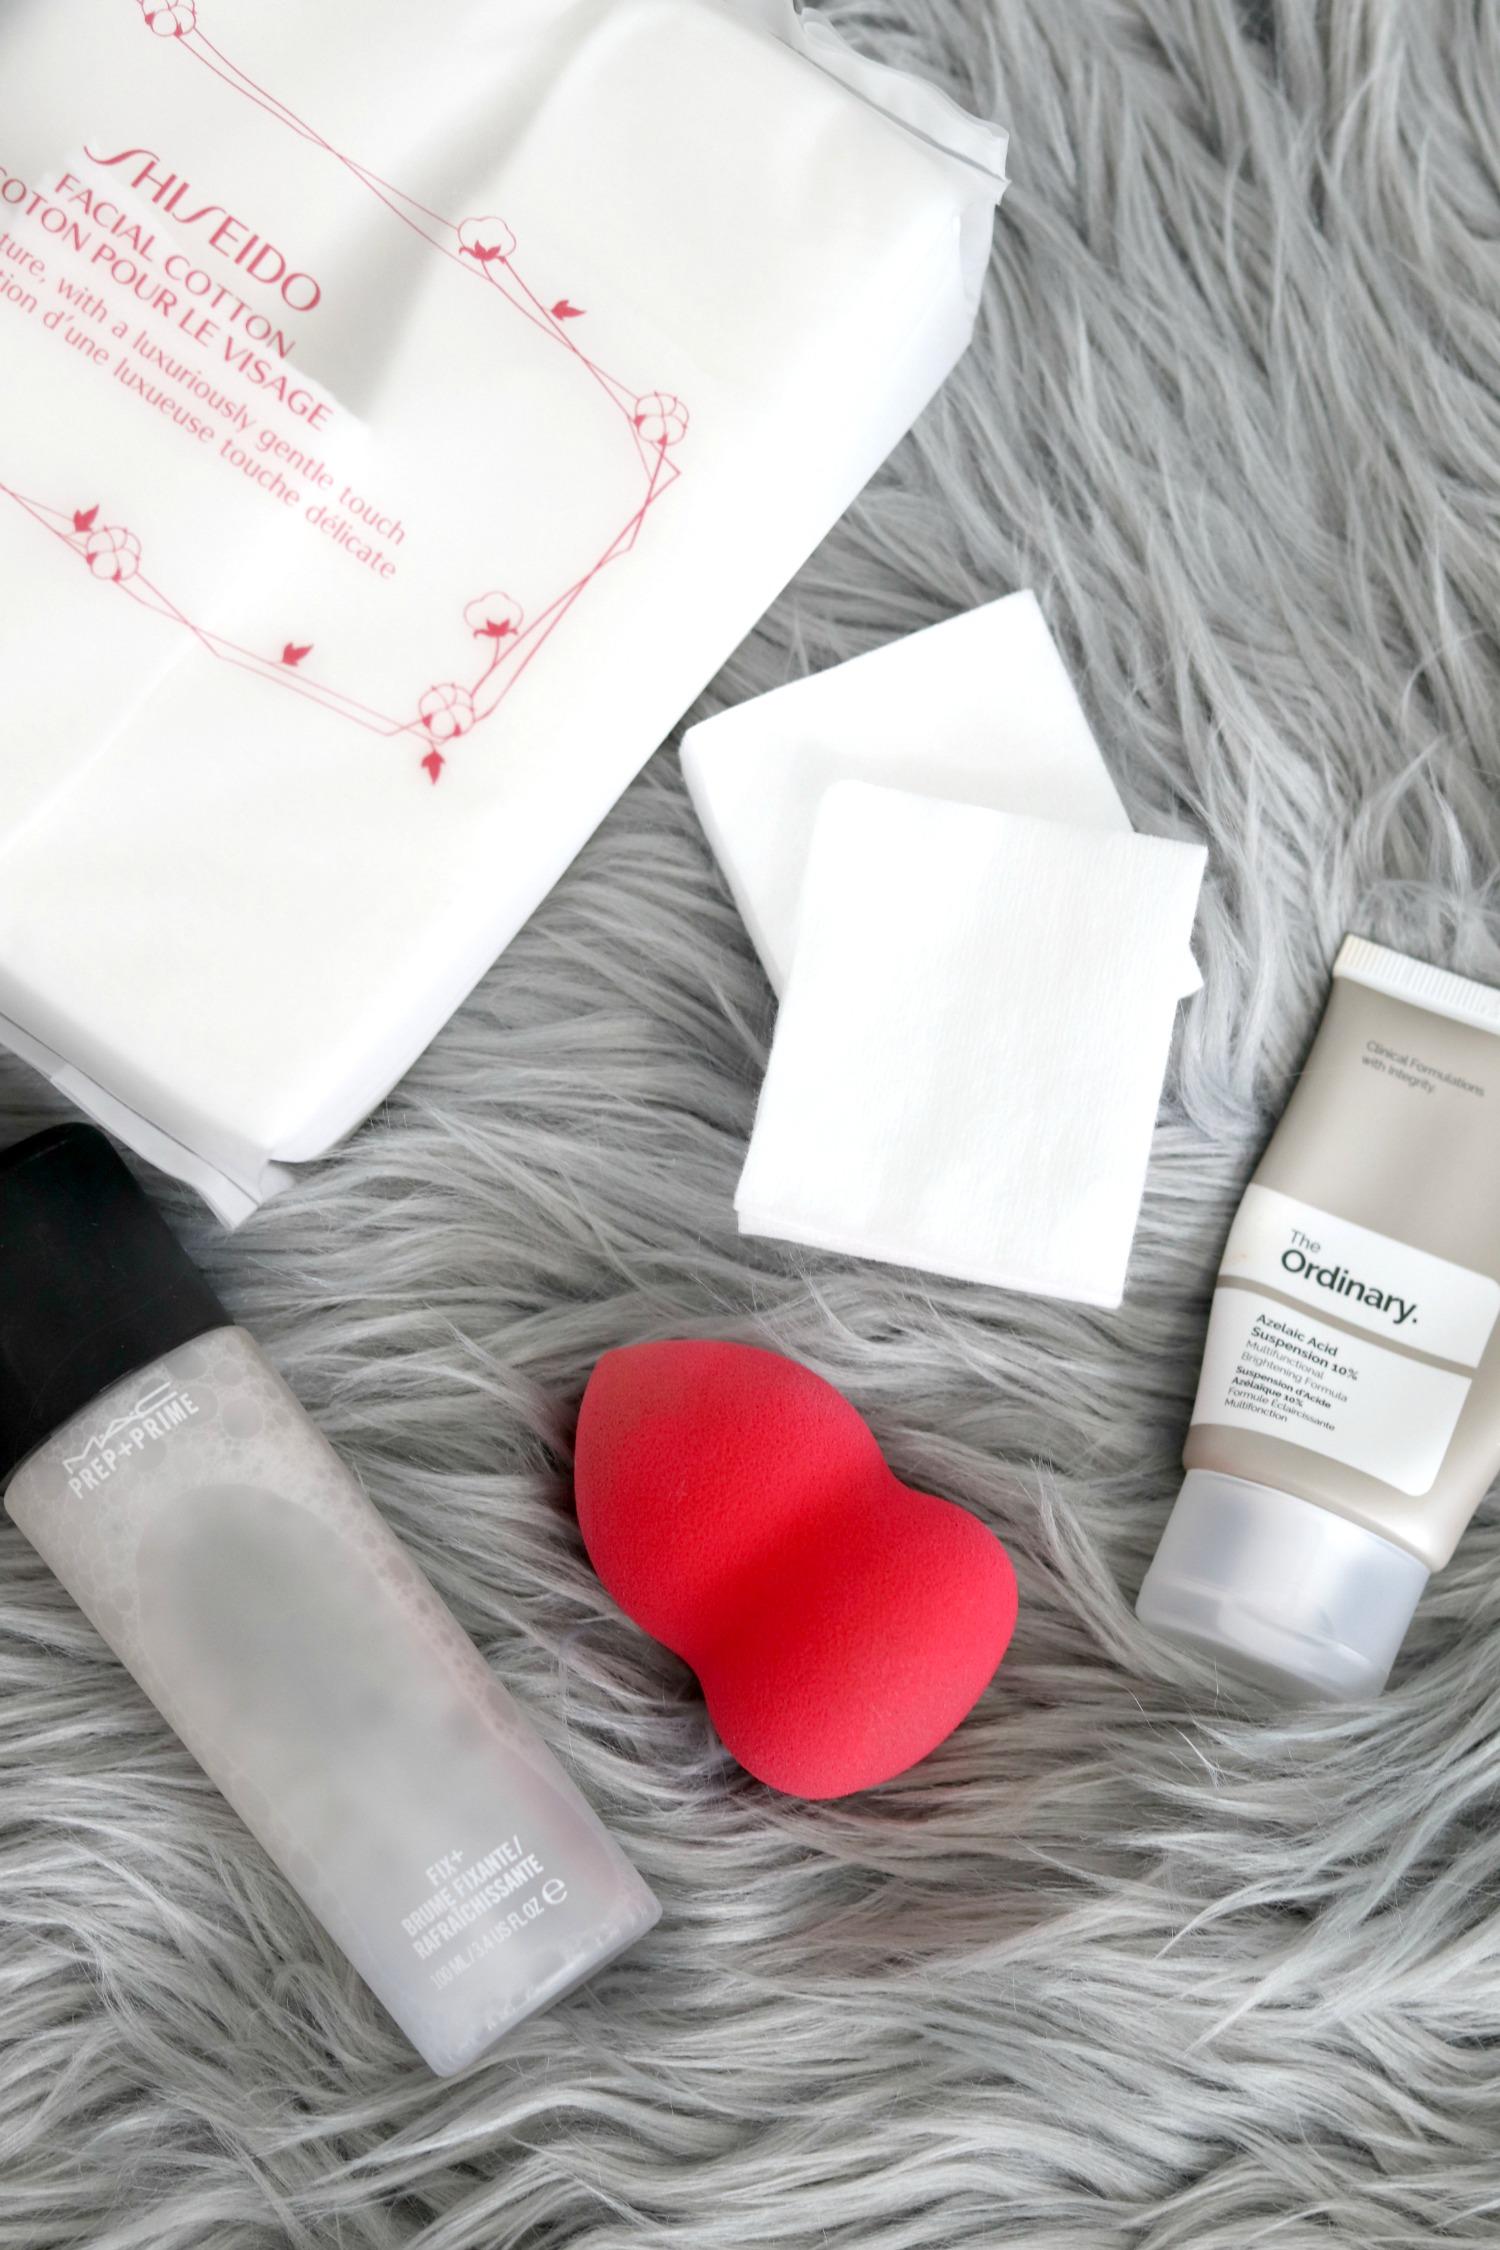 Spring Sephora and Ulta Haul 2018 Shiseido Facial Cotton, MAC Prep and Prime Fix+, Morphe Blending Sponge Ulta, The Ordinary Azelaic Acid